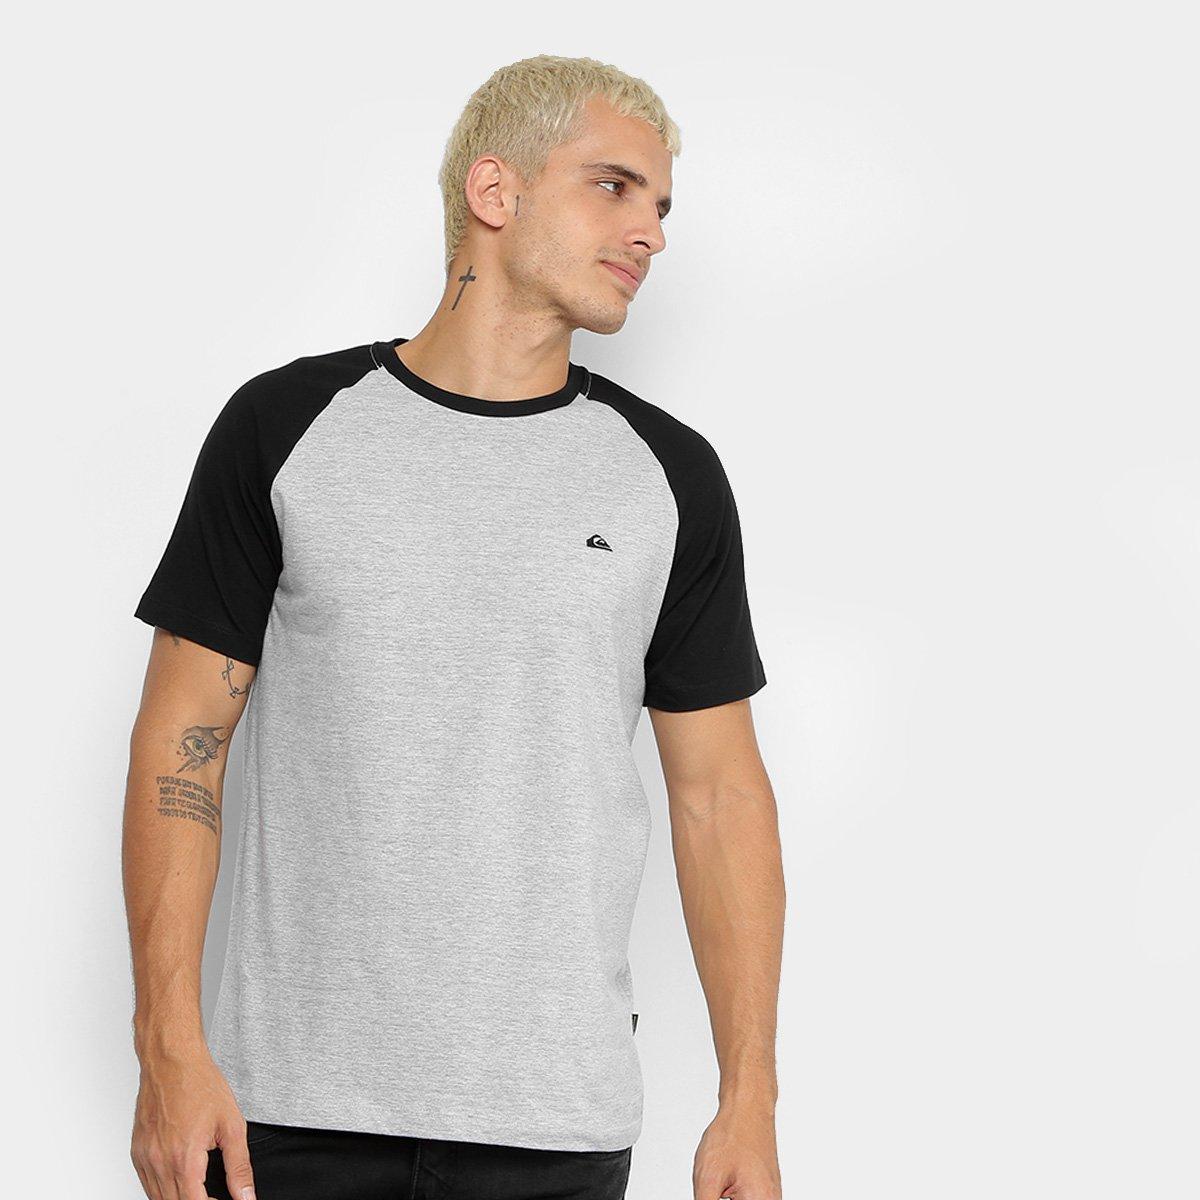 7569c9de8b6d7 Camiseta Quiksilver Especial Everyday Raglan Masculina